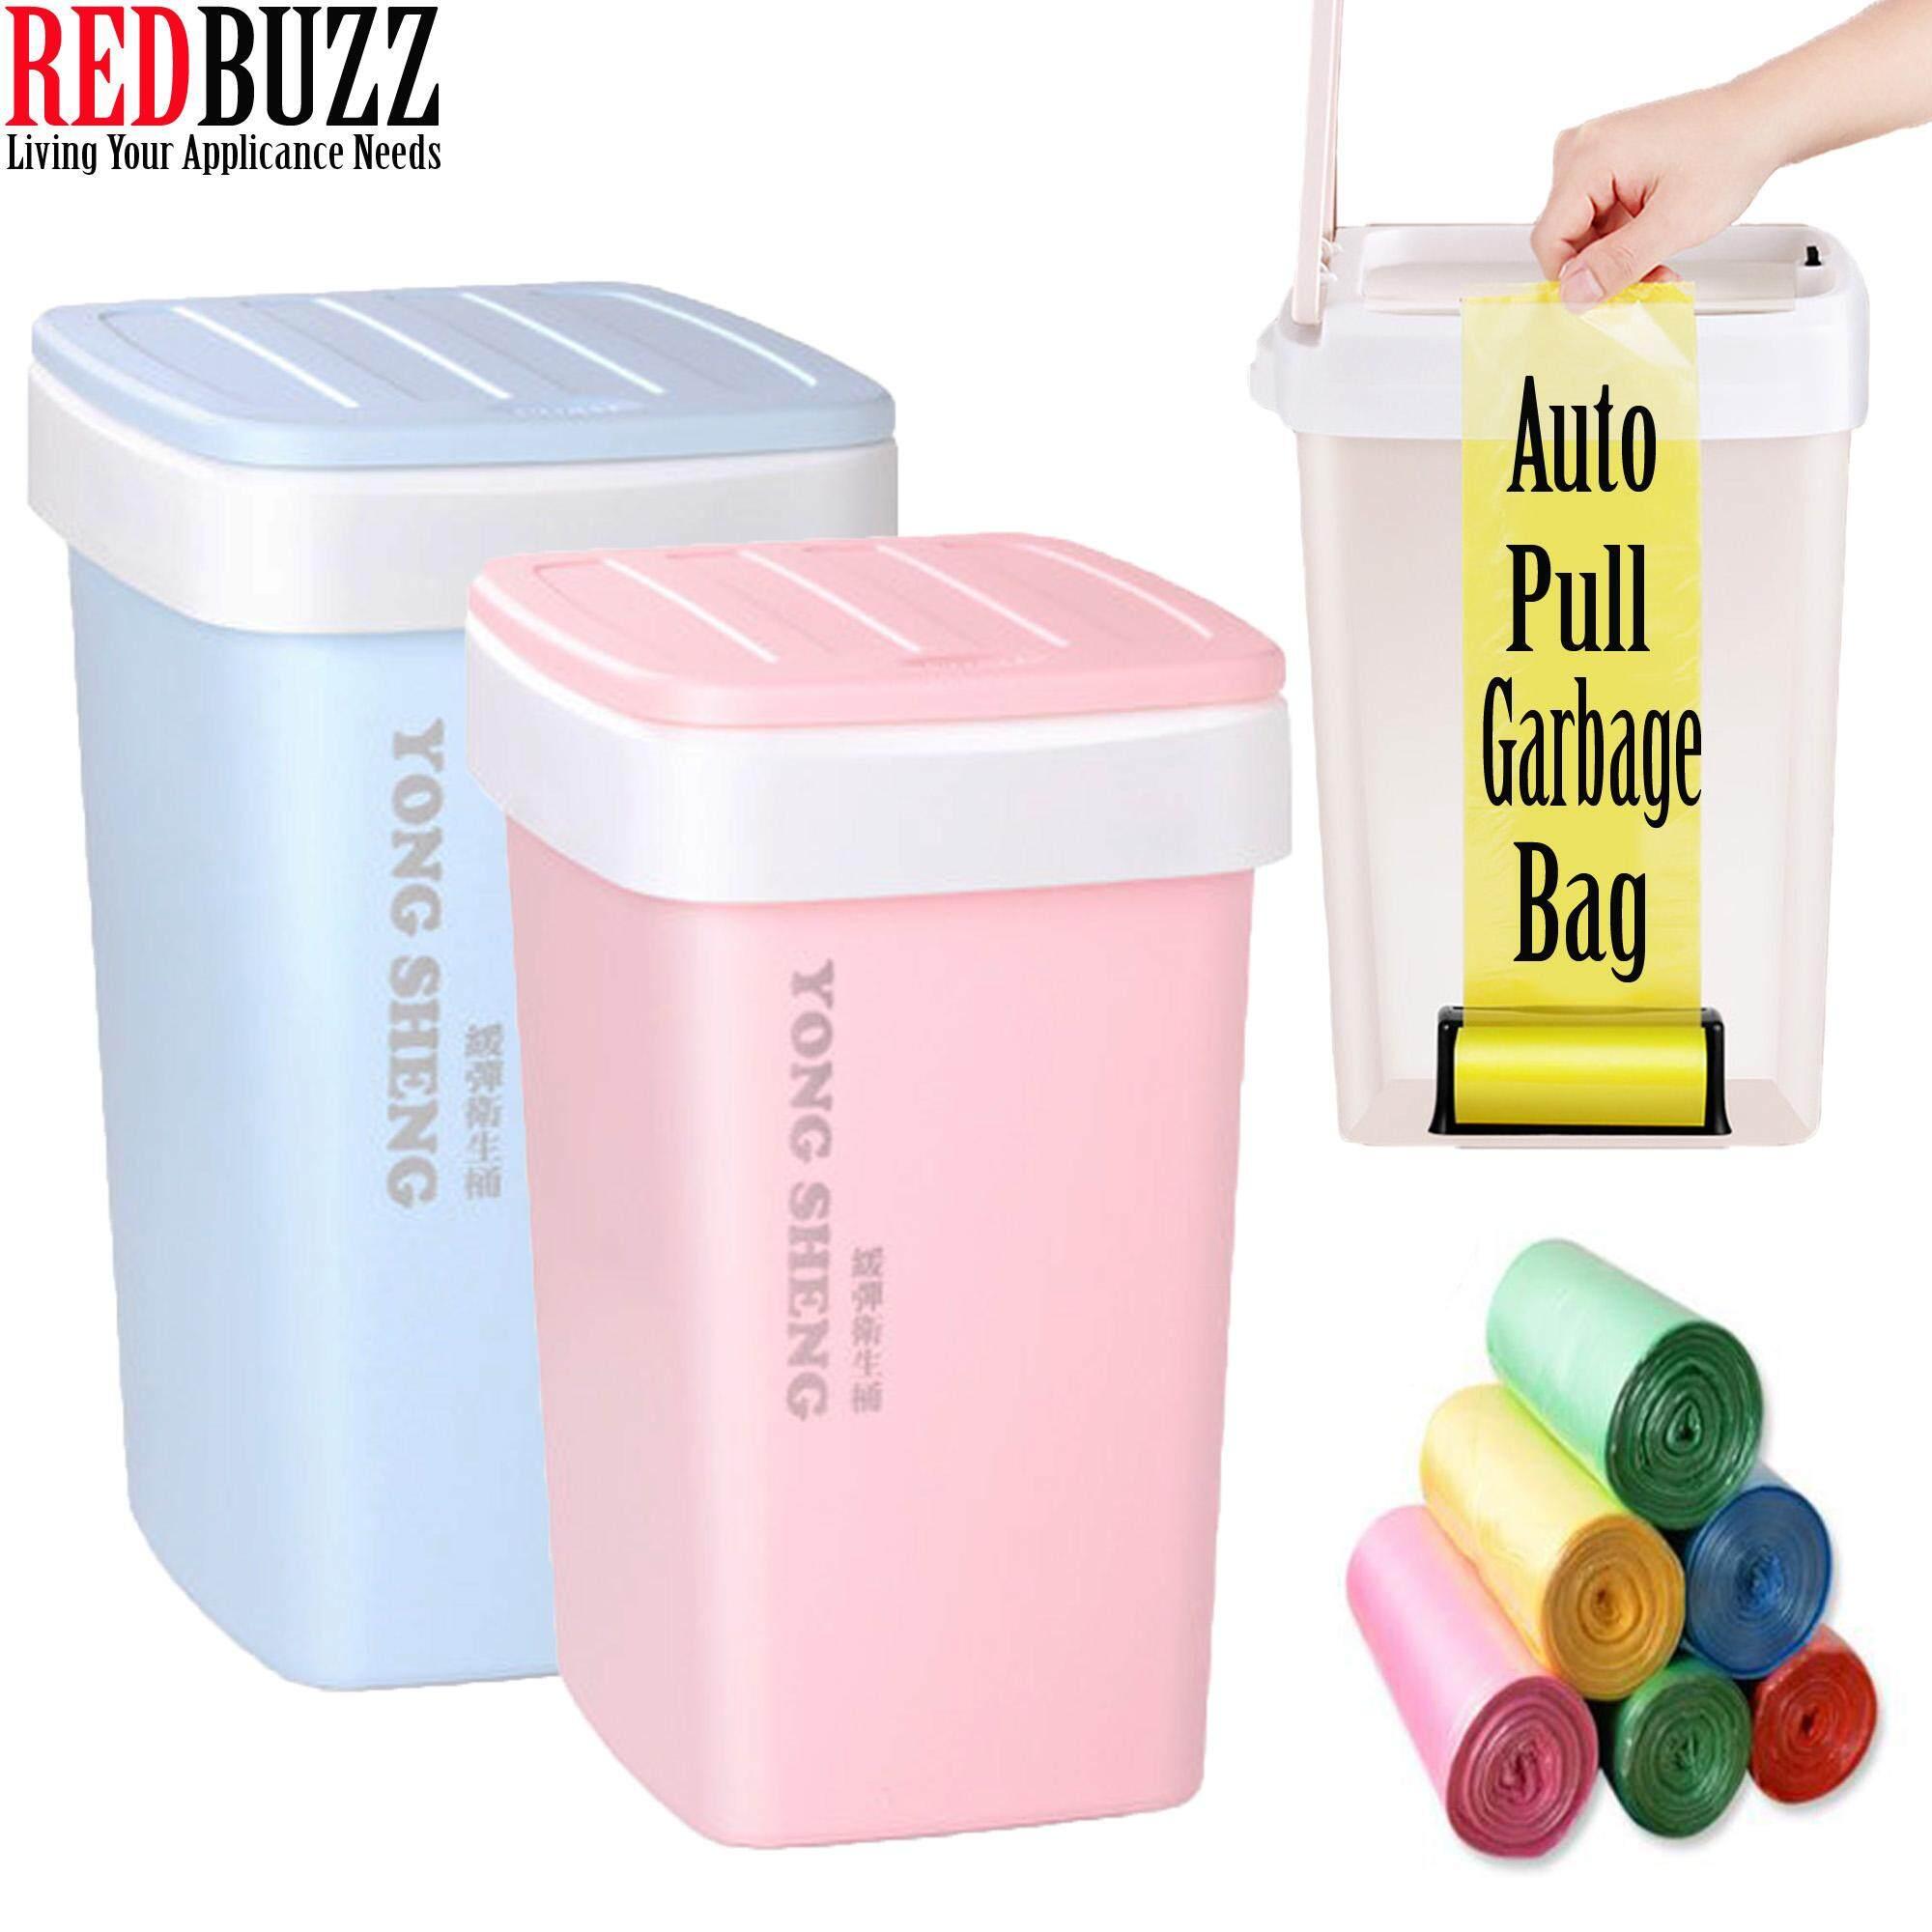 REDBUZZ Auto Pulling Garbage Bag Dustbin /Sanitary Bucket + Free 6R Garbage Bag